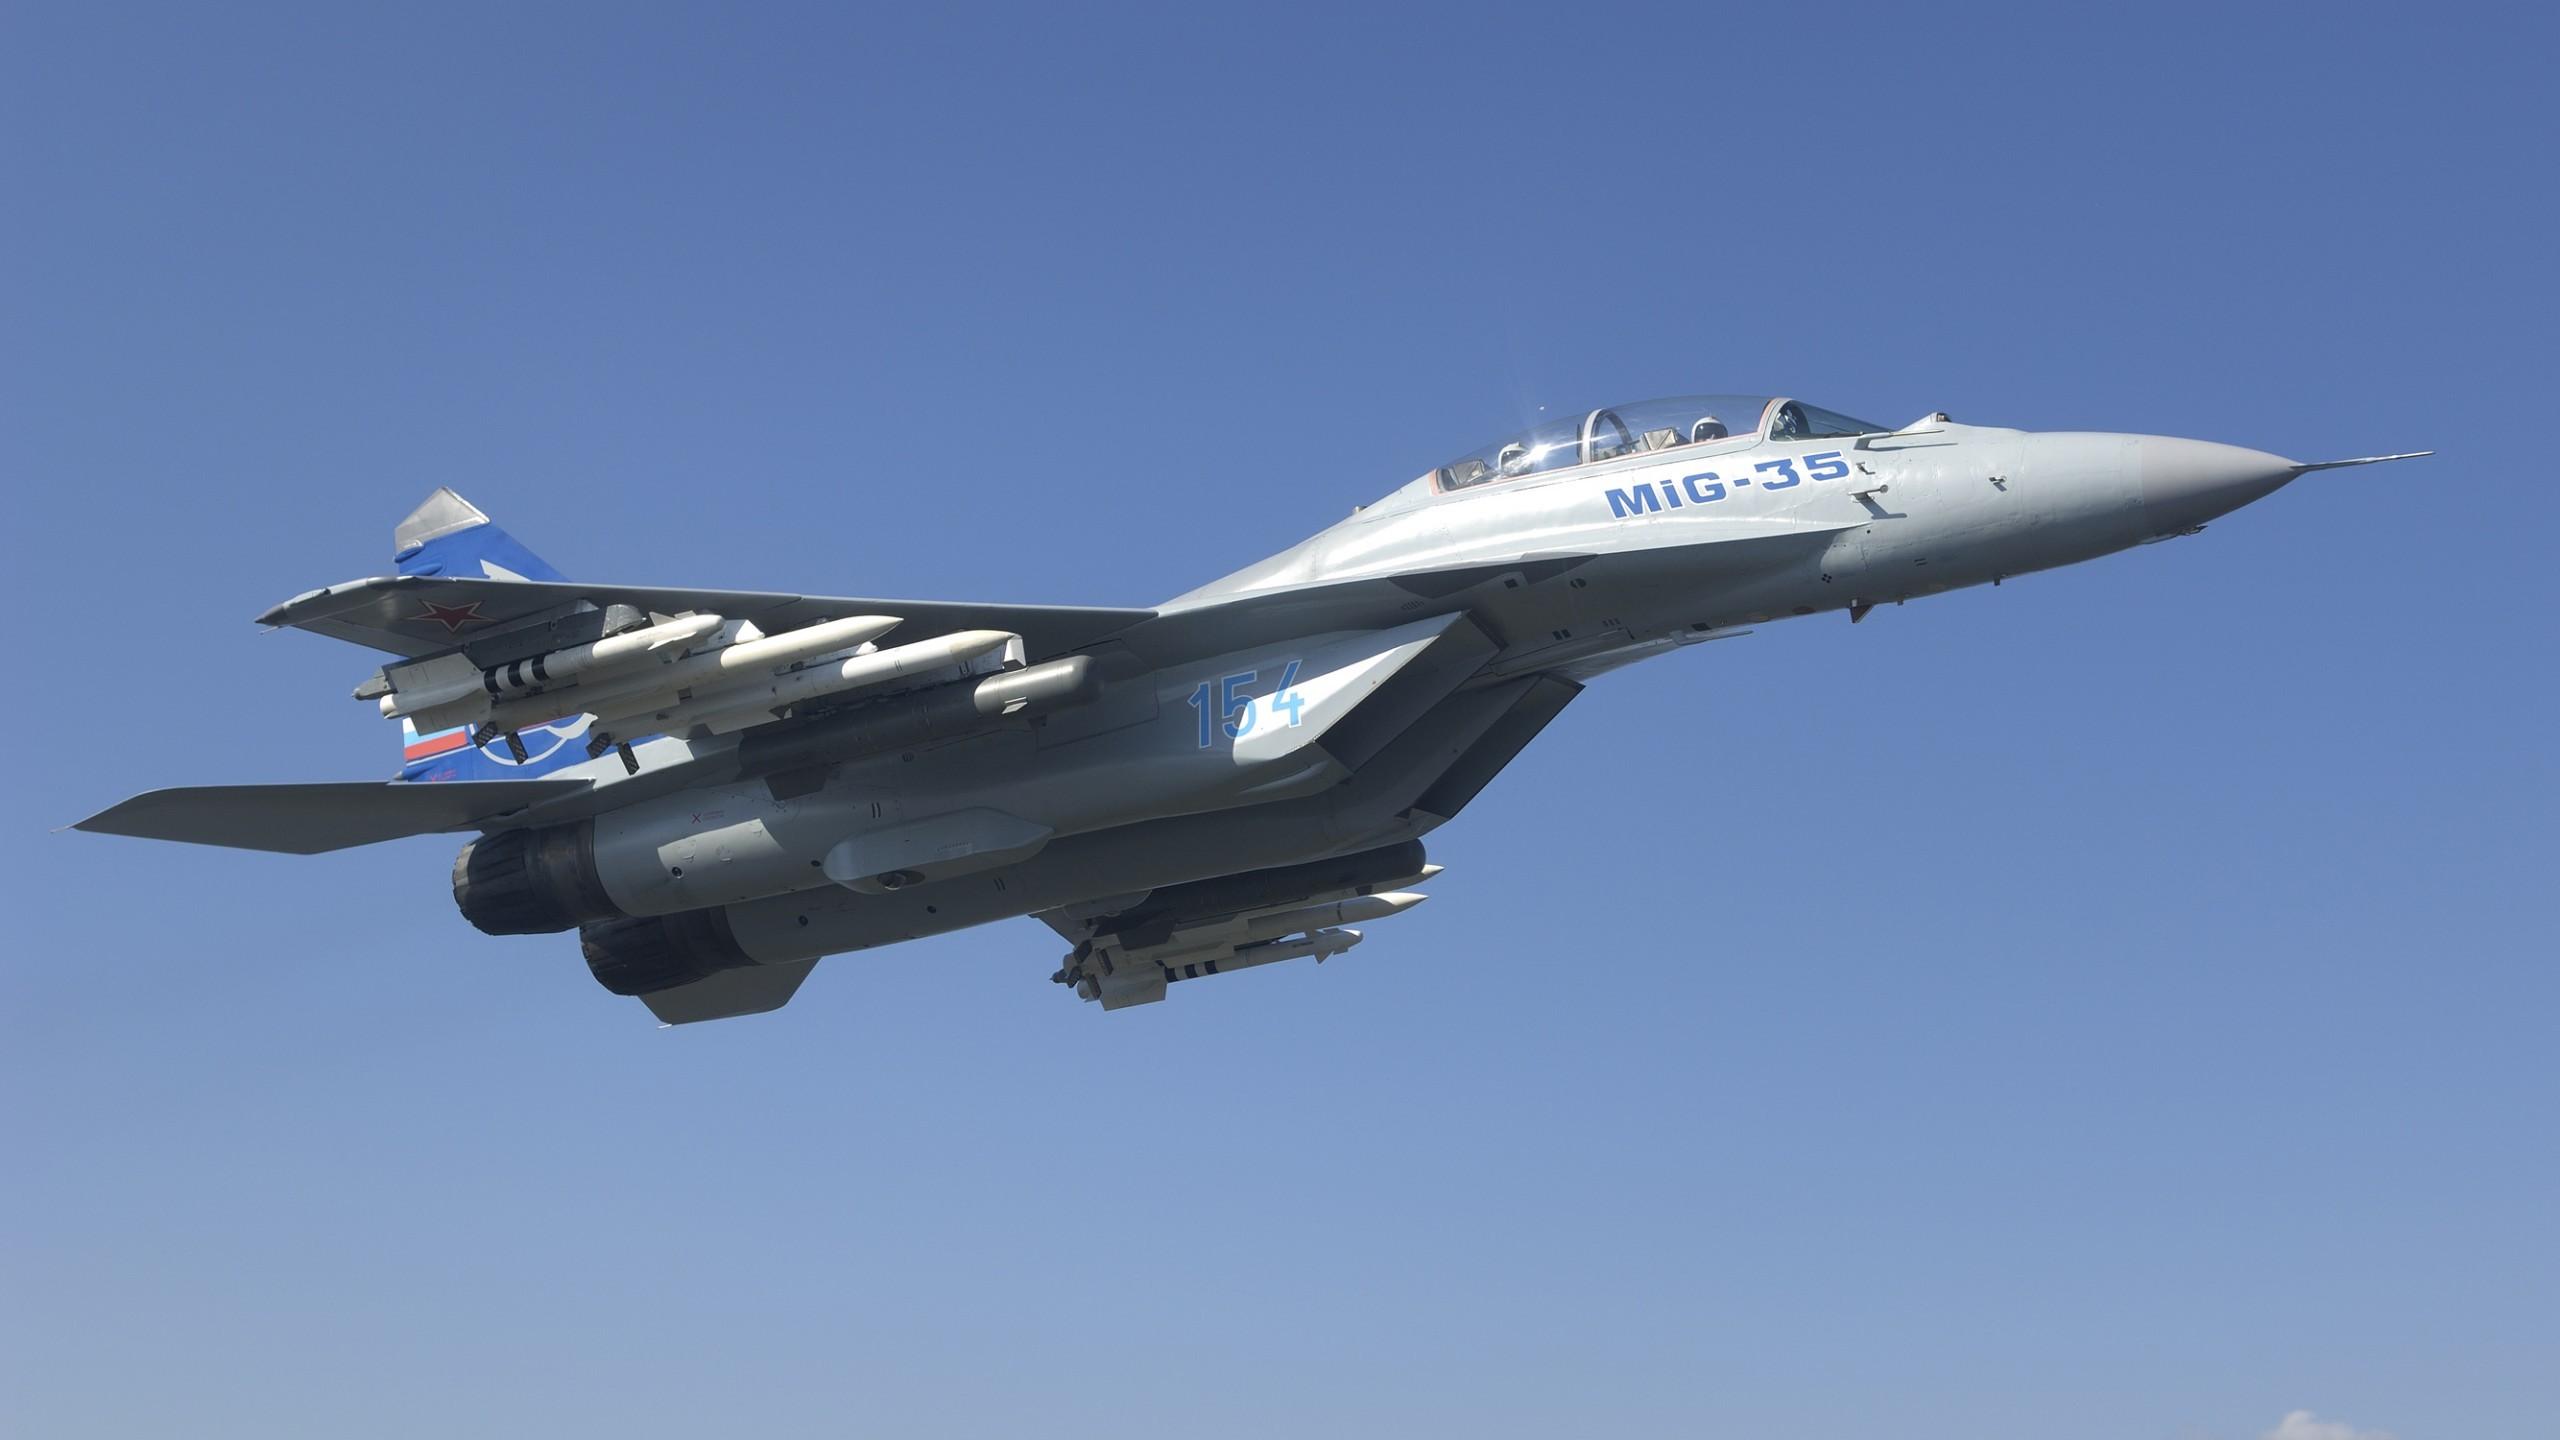 Military / Mikoyan MiG-35 Wallpaper